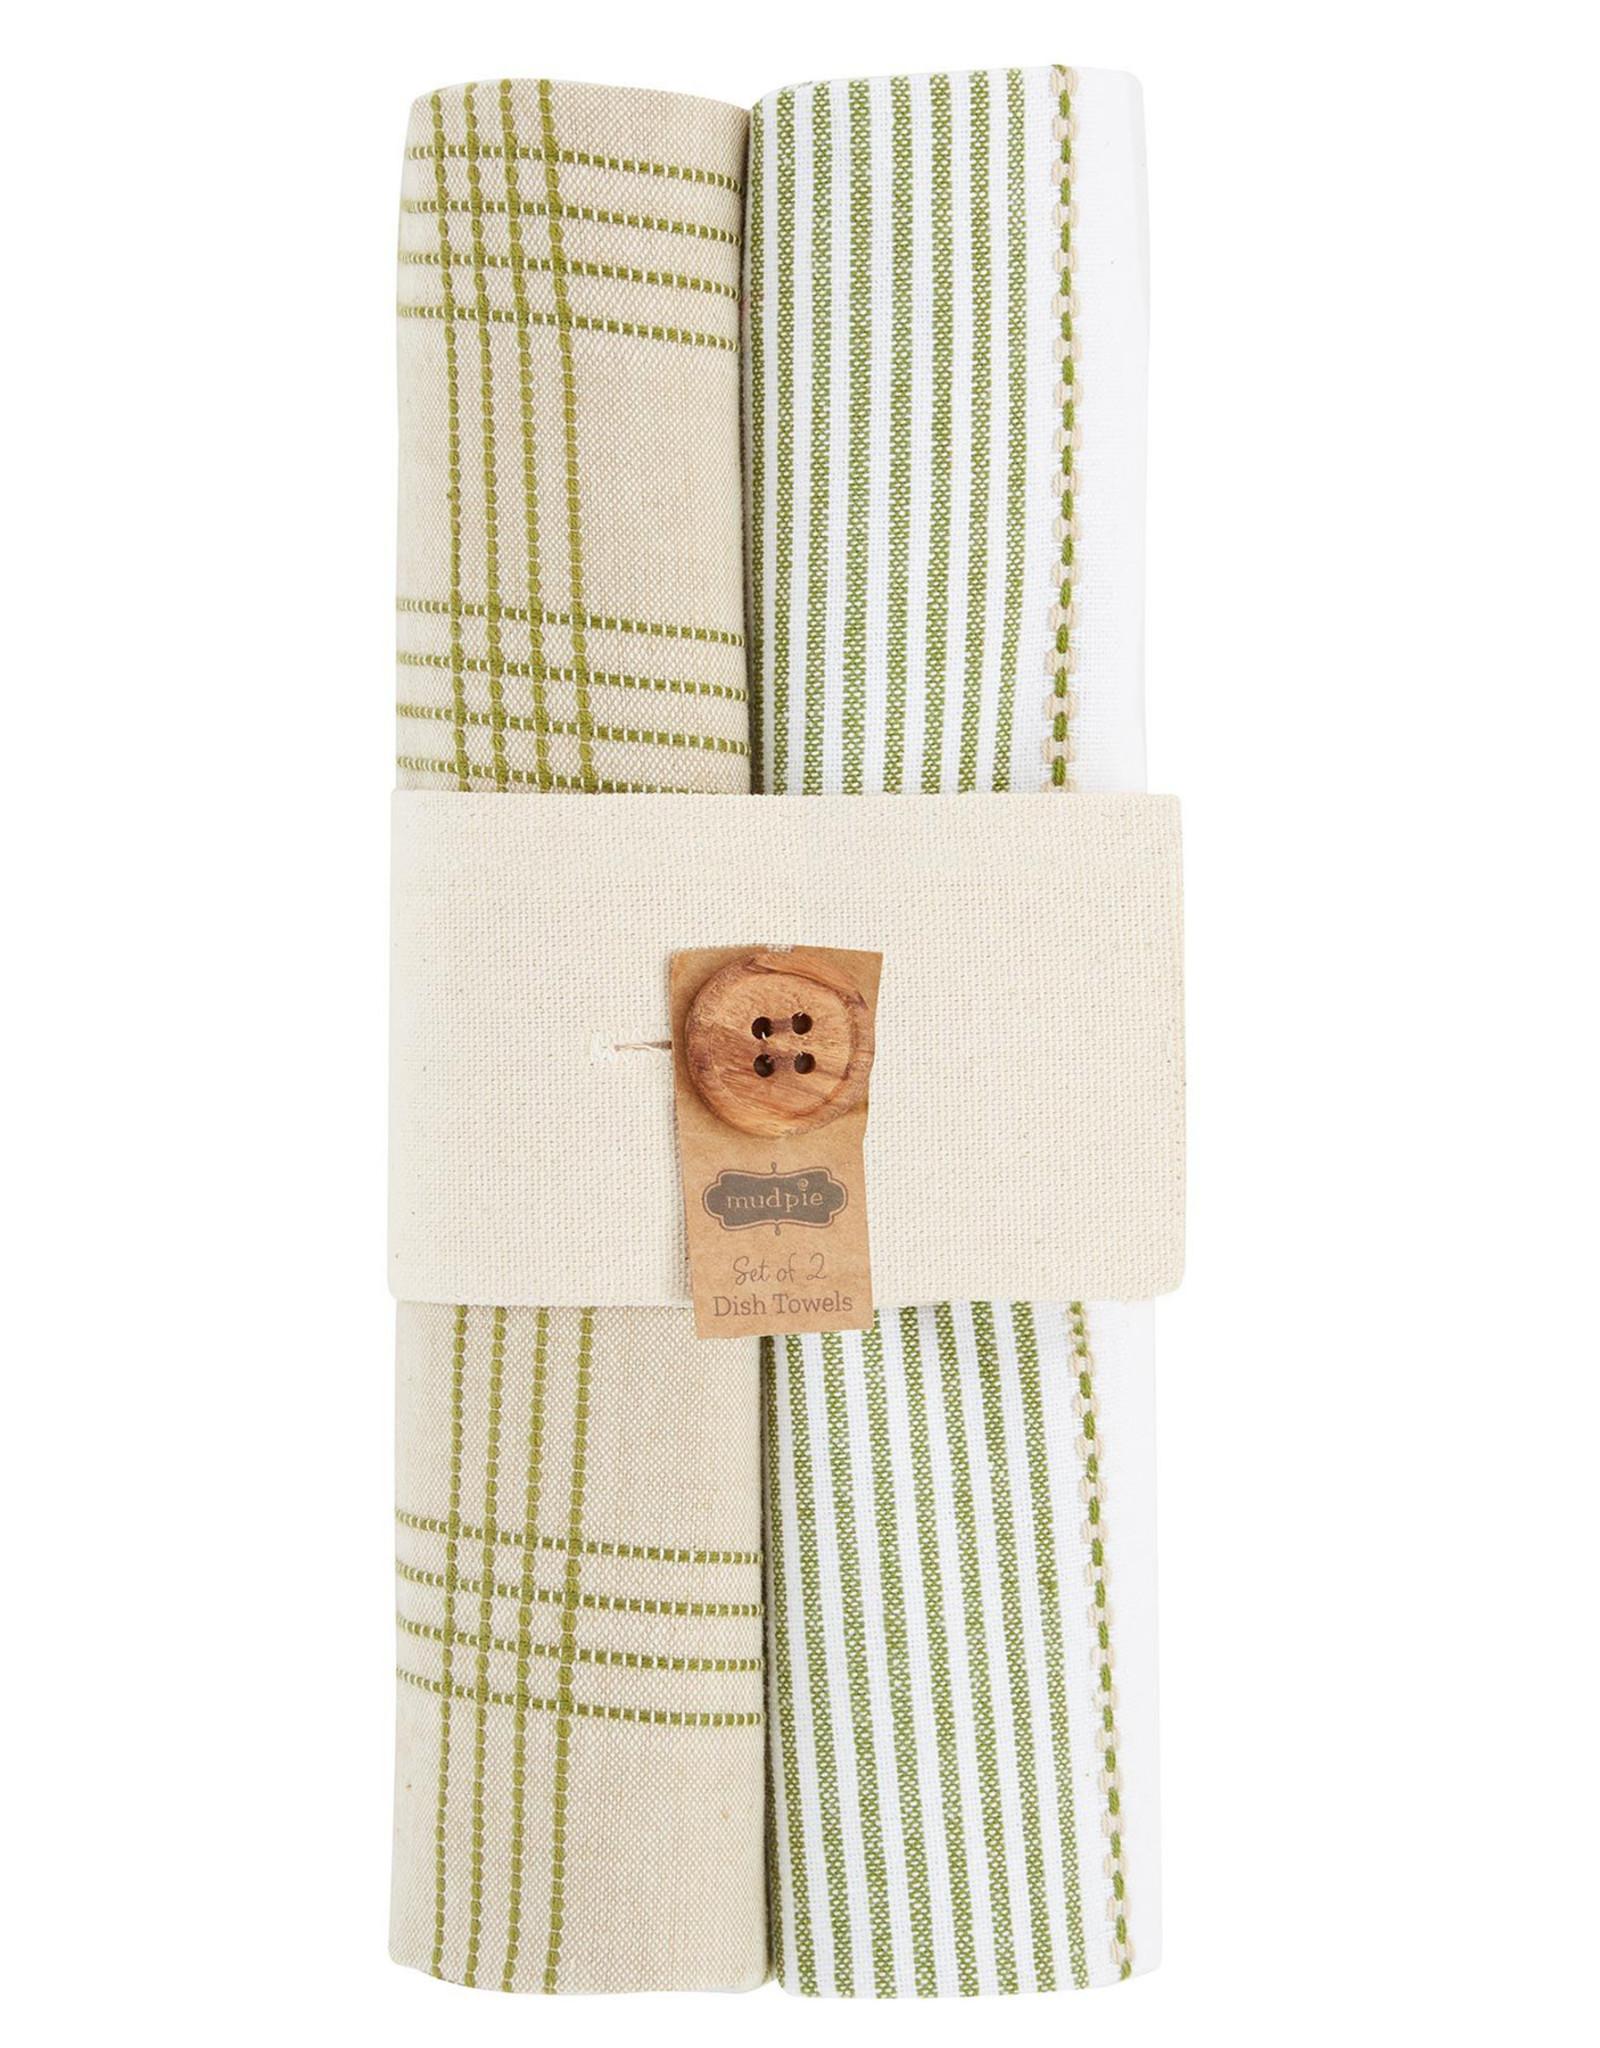 Dish Towel Set - Green & Taupes